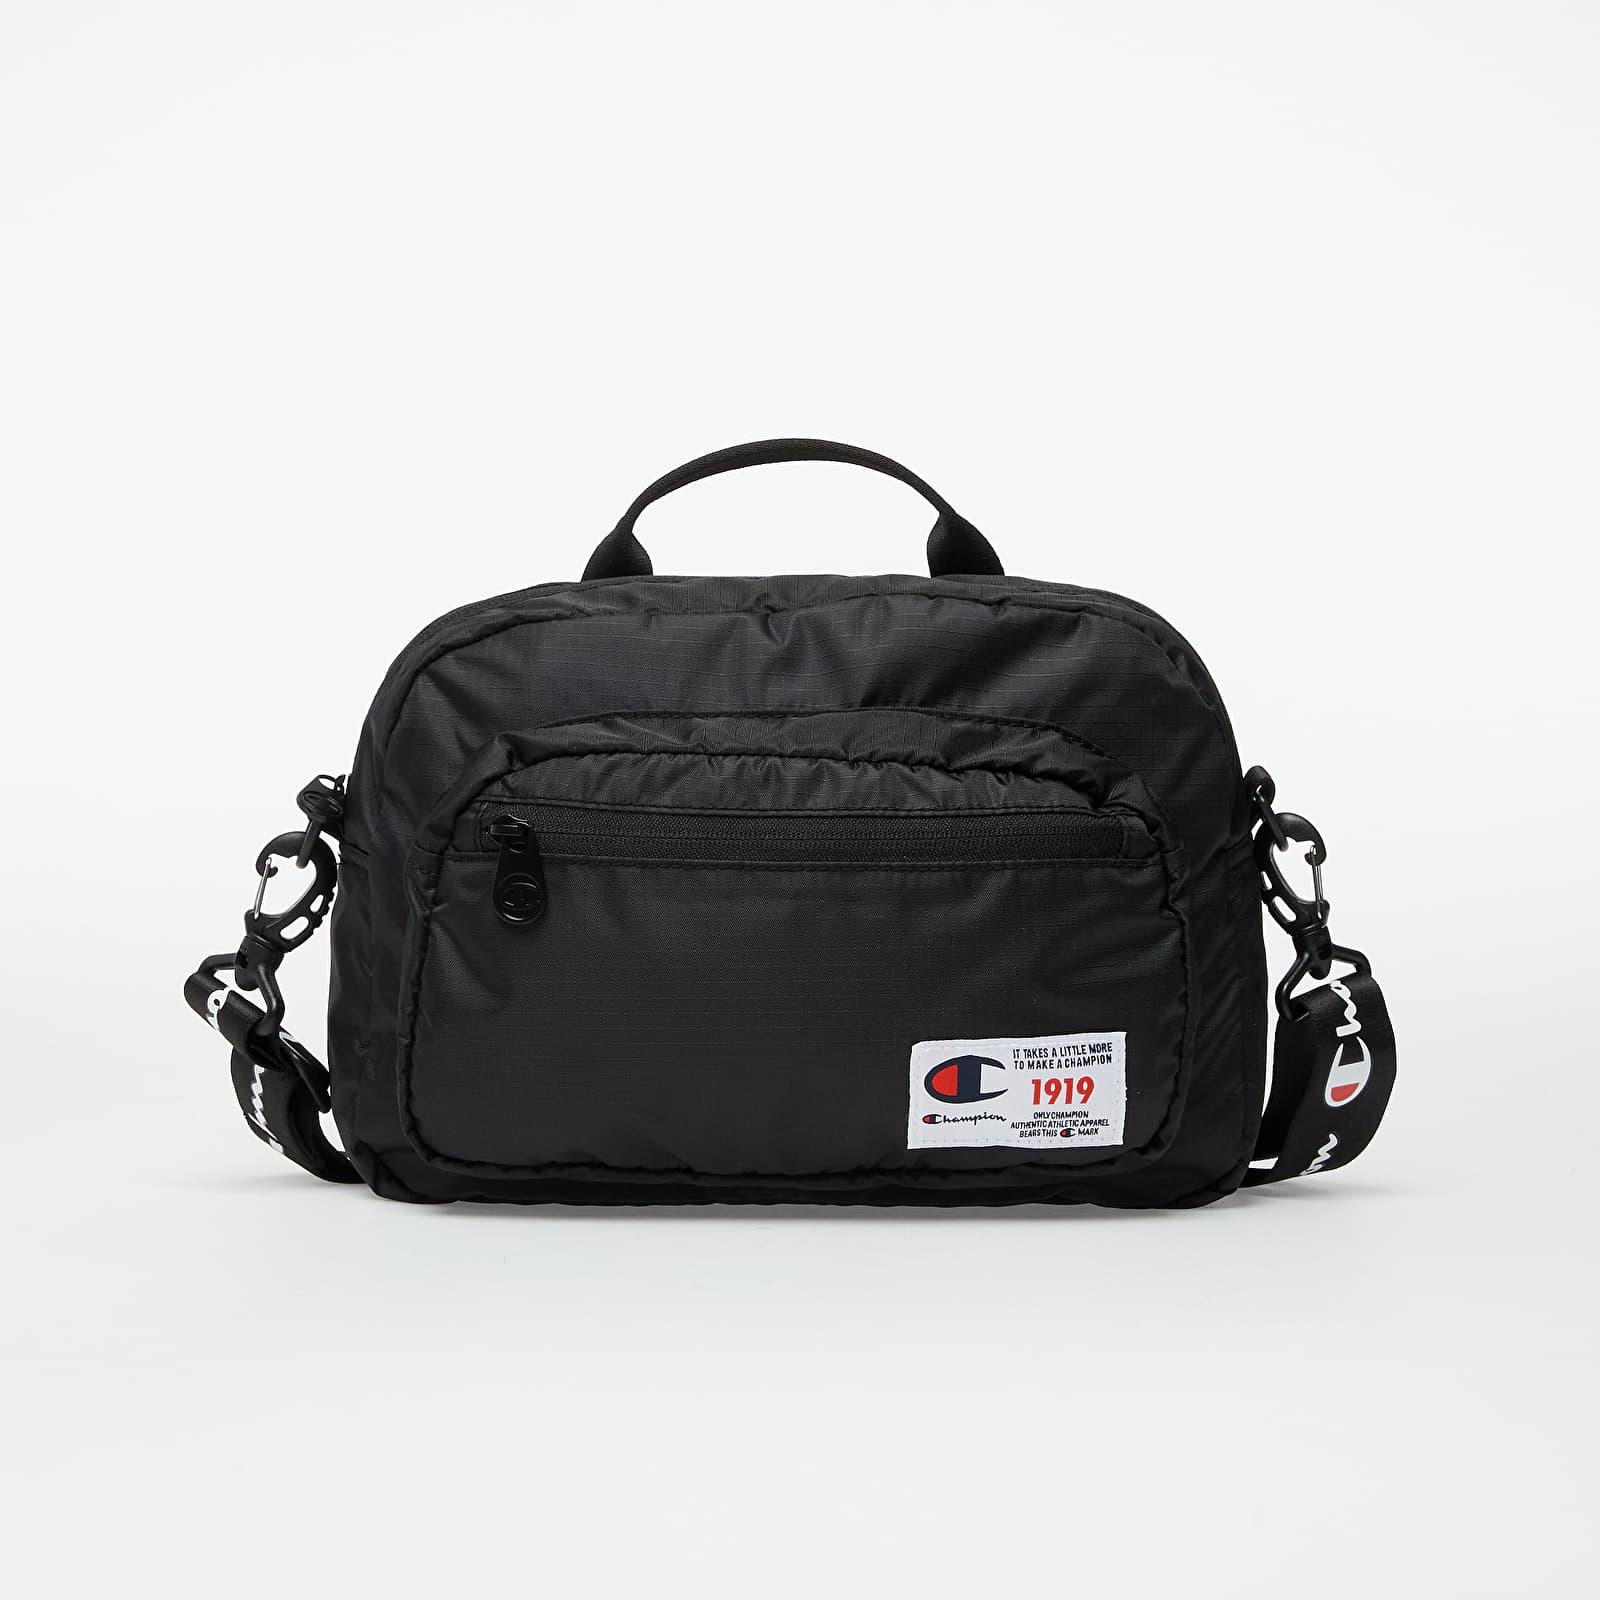 Bags Champion Bag Black